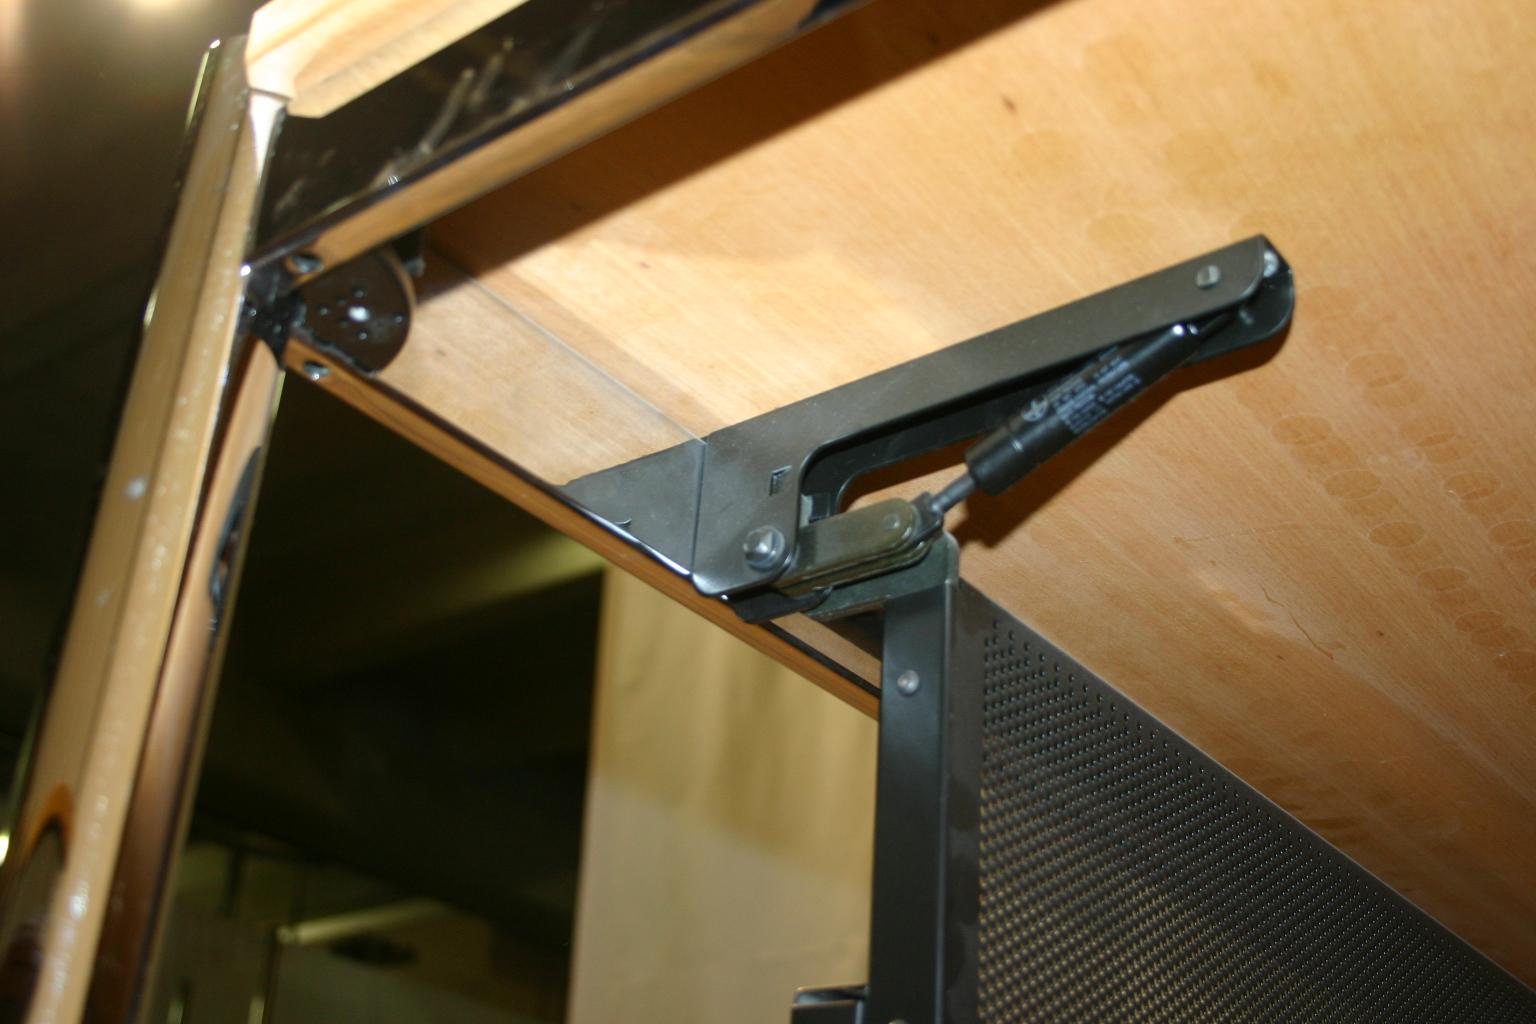 knieblende kabelkorb von usm haller in schwarz. Black Bedroom Furniture Sets. Home Design Ideas